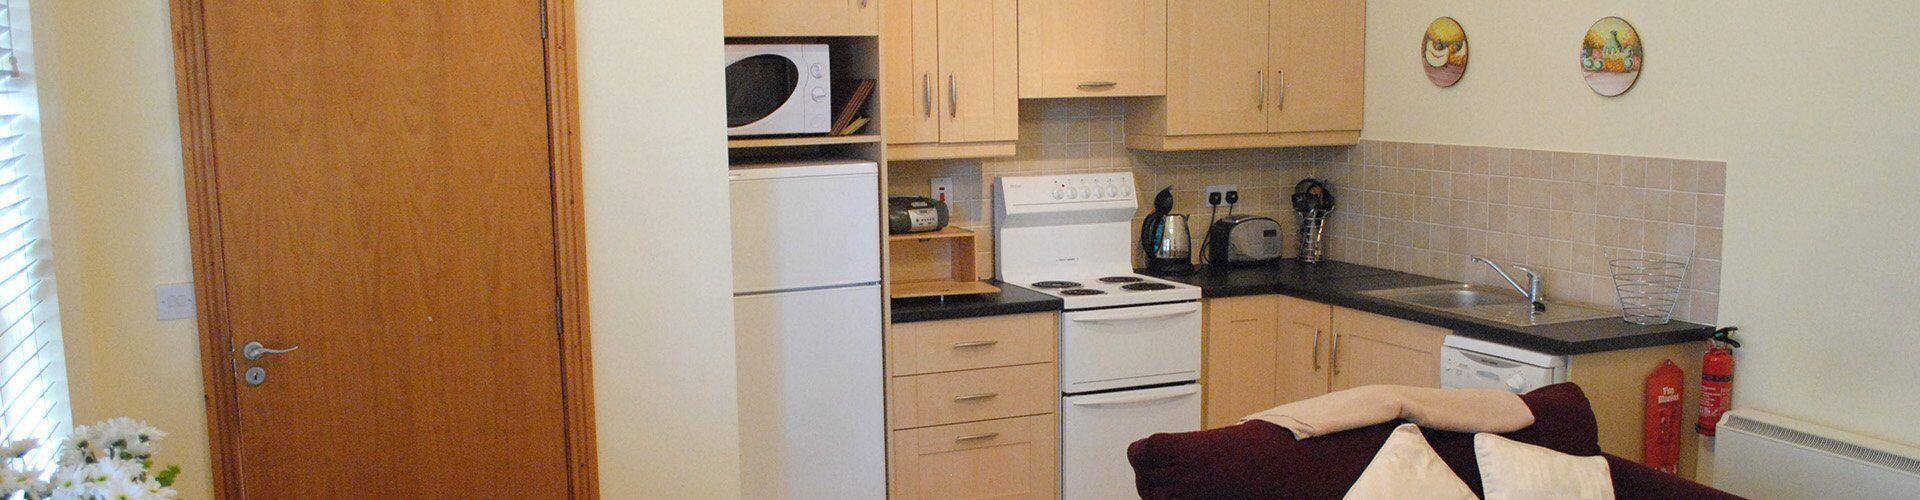 Killiane Castle Self Catering Apartments